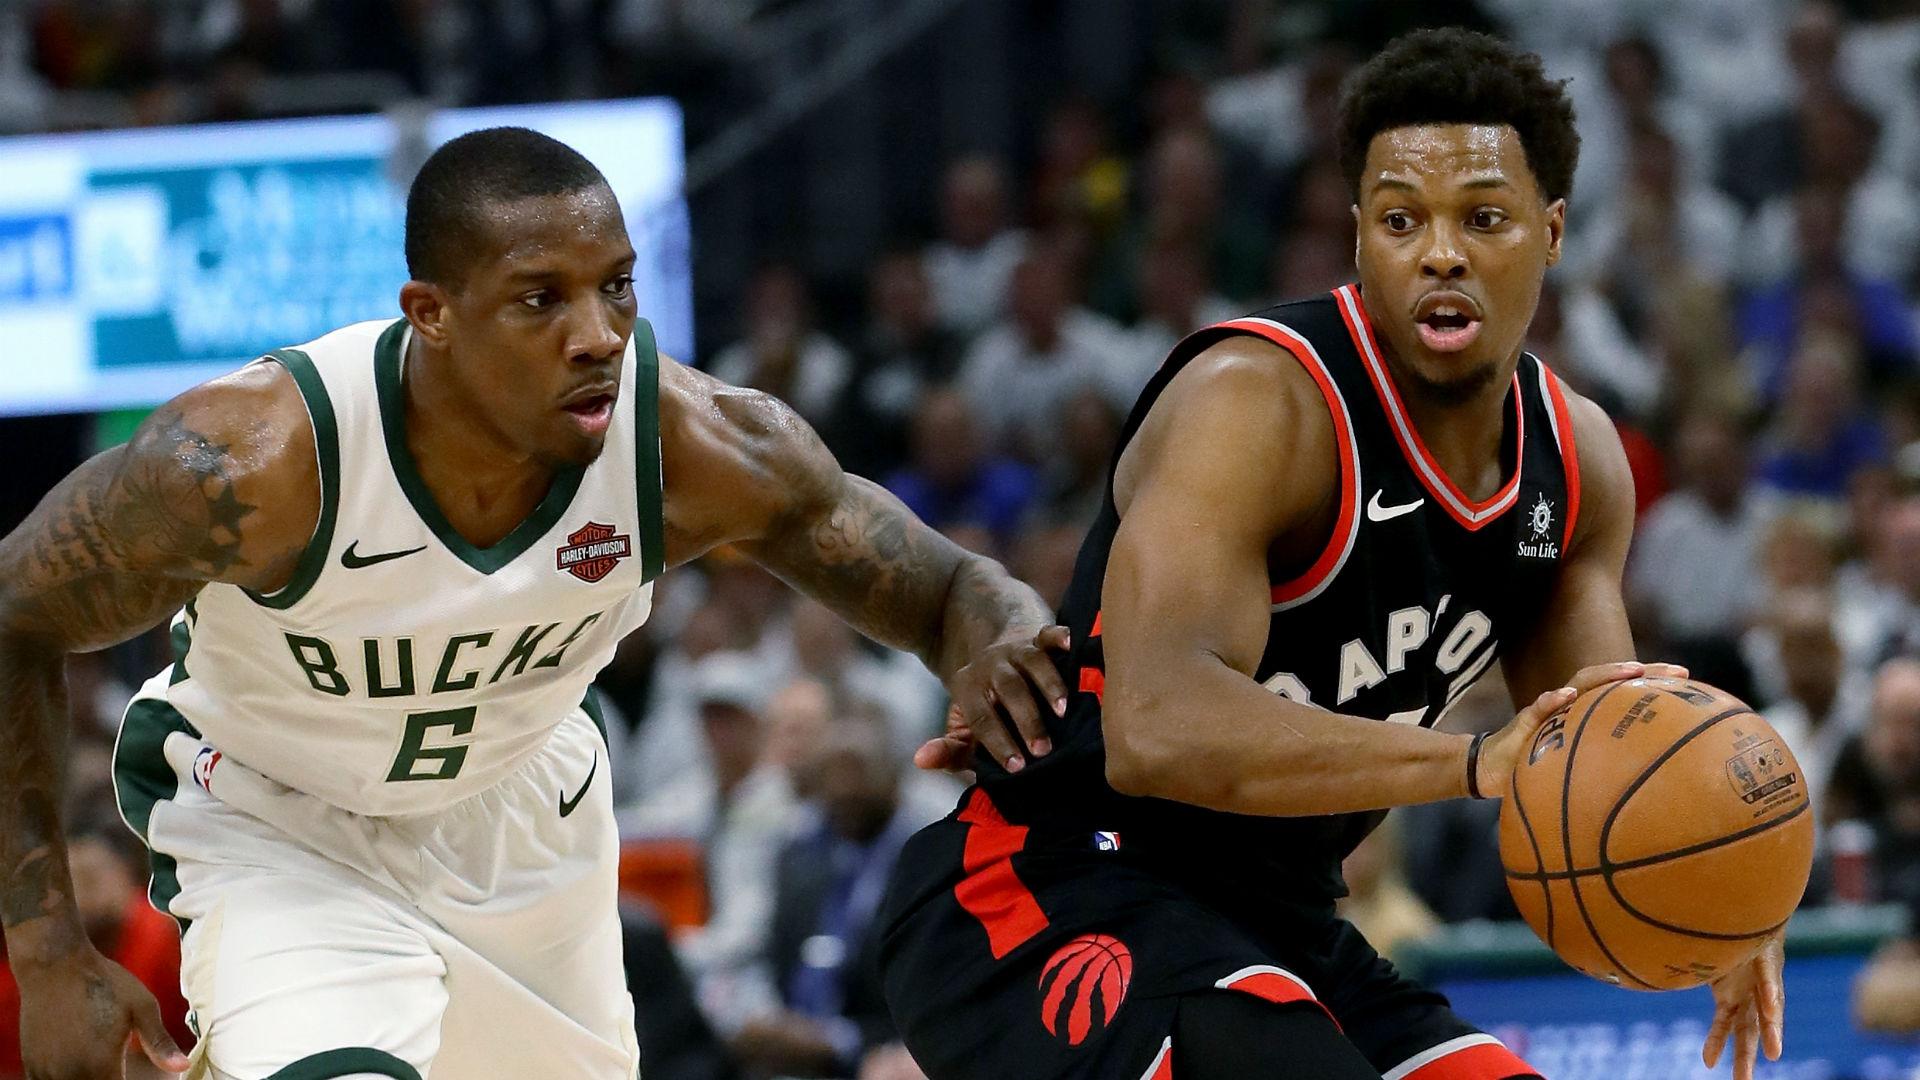 Nba Playoffs 2019 Raptors Kyle Lowry On Game 1 Vs Bucks